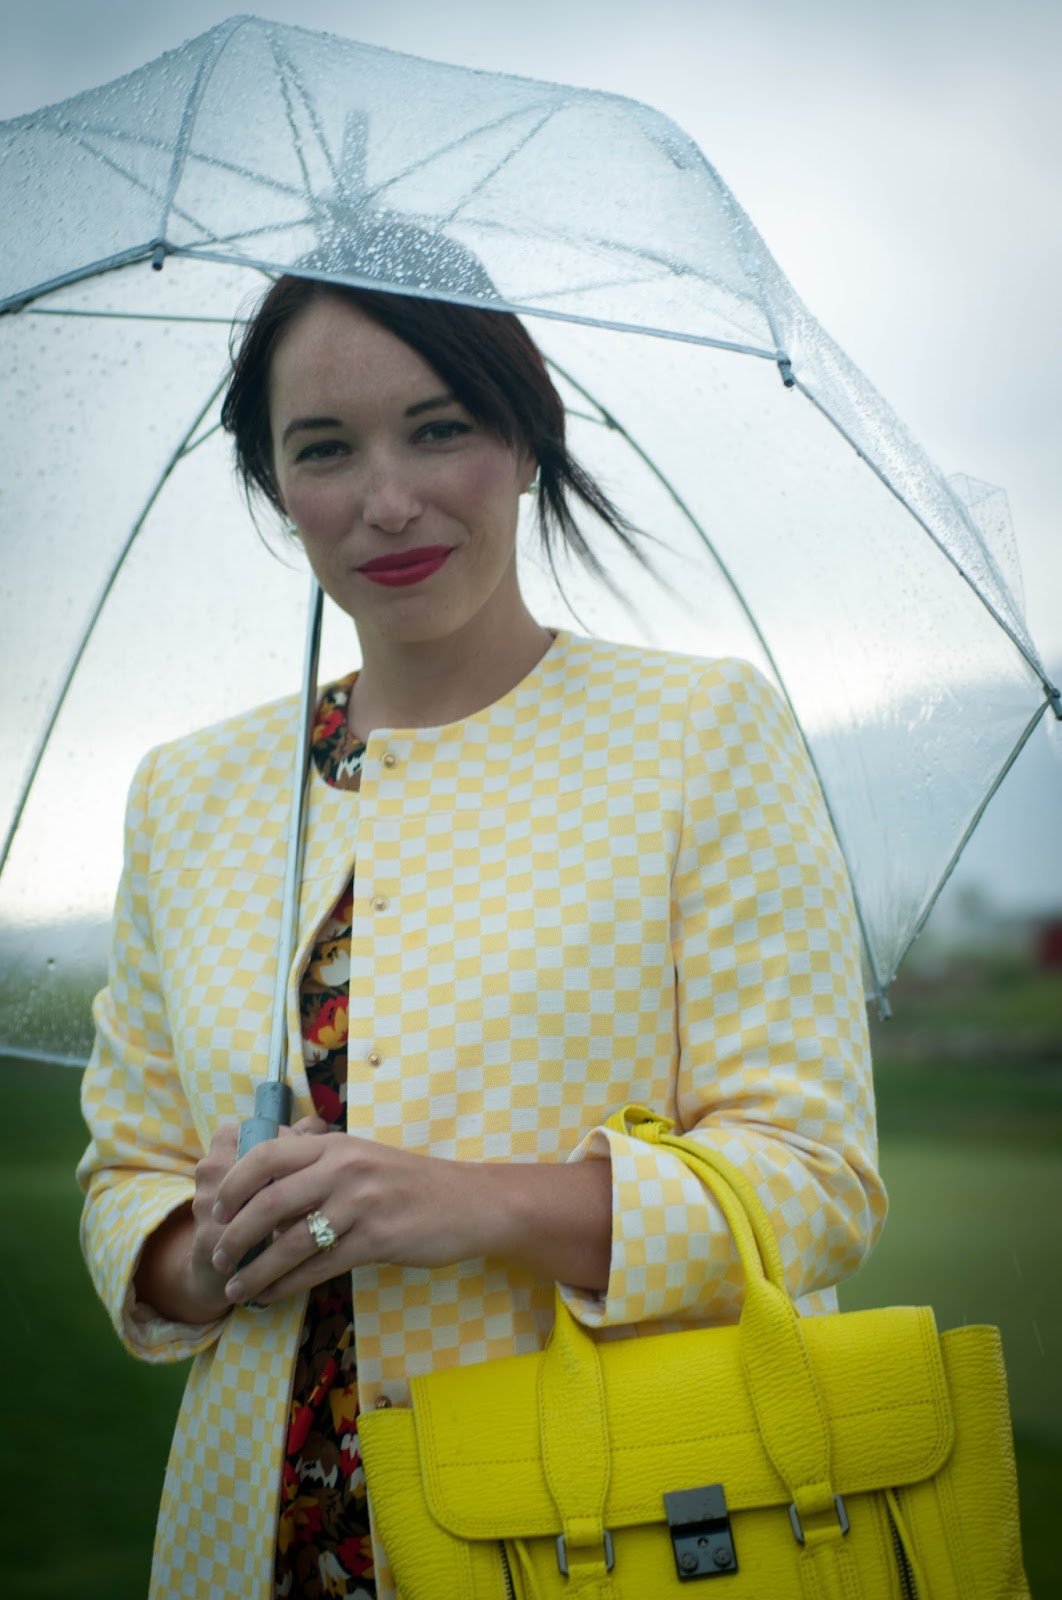 ootd, anthropologie ootd, fashion blog, style blog, target style, target umbrella, zara coat